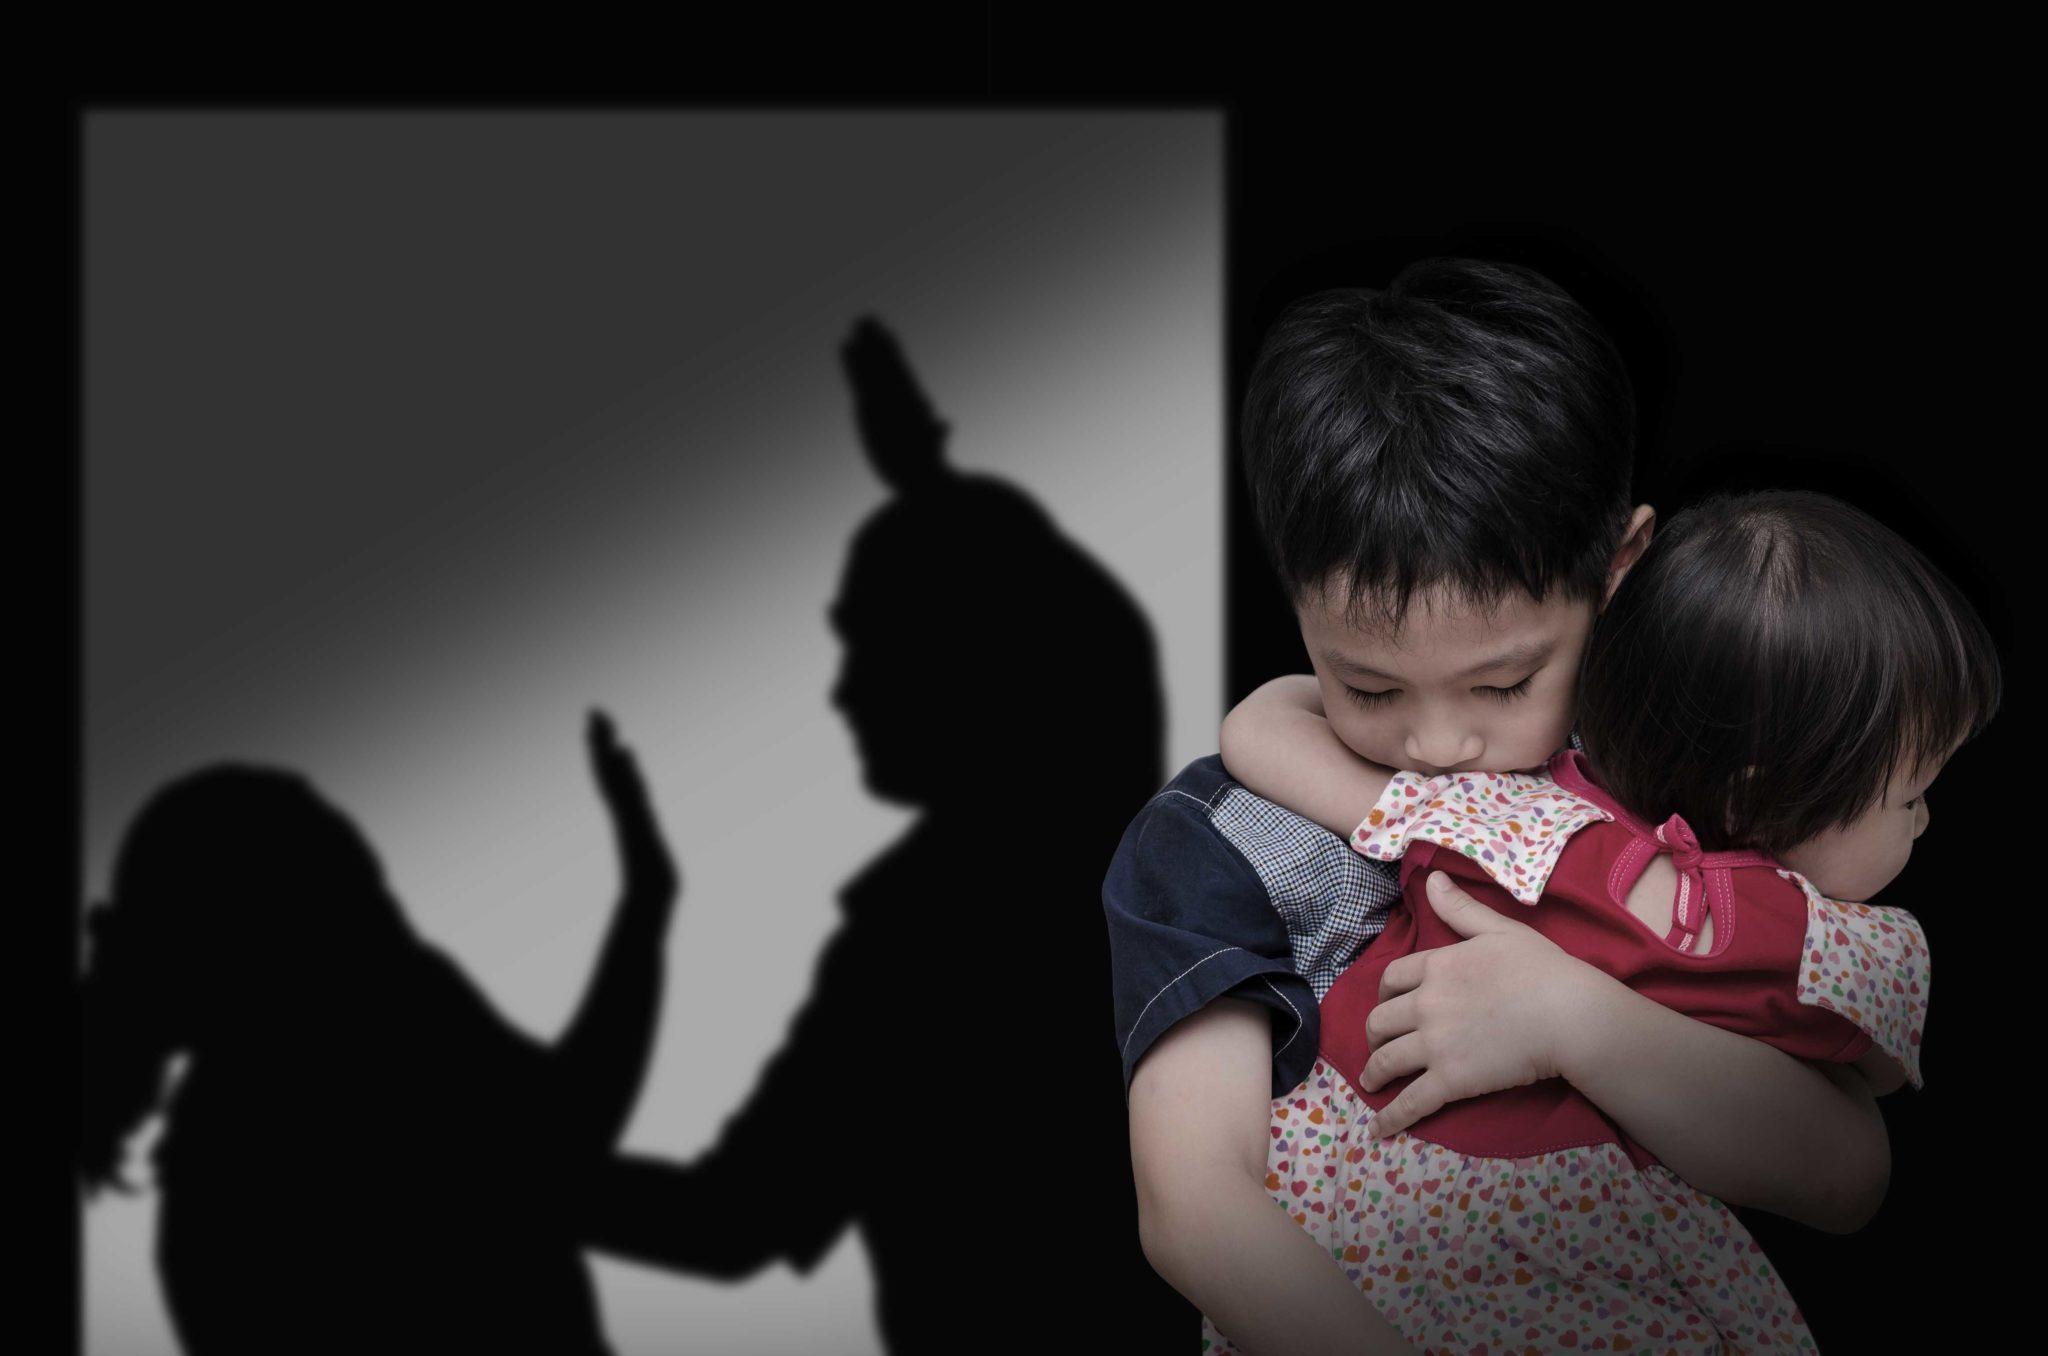 4 types of child abuse kidsrusfoundation